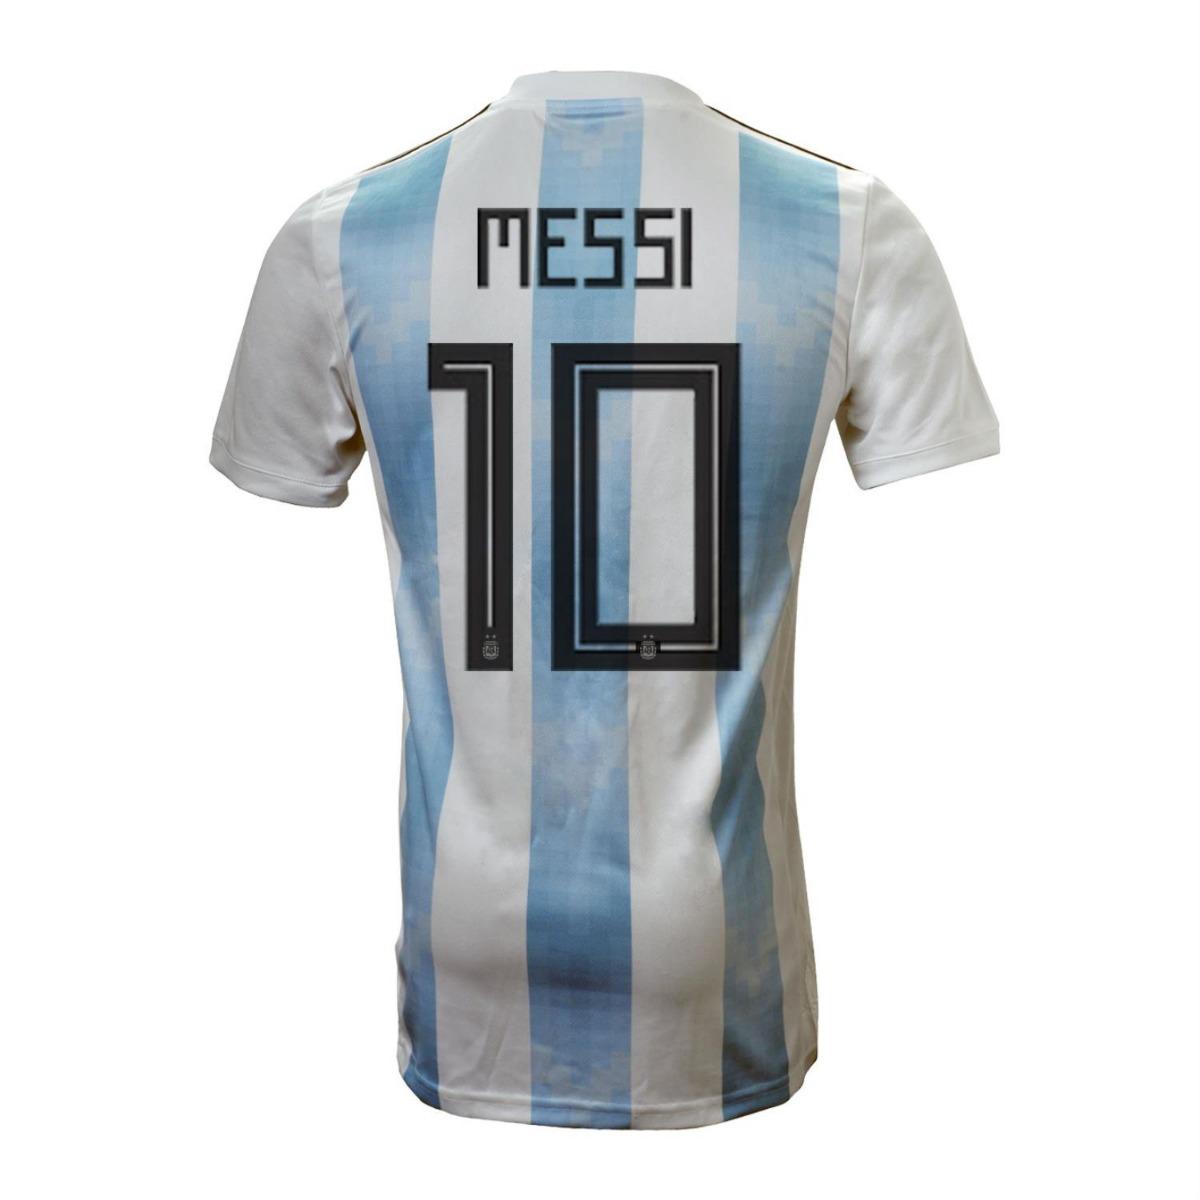 camiseta seleccion argentina mundial 2018 adidas messi 10. Cargando zoom. 91a93094a453c